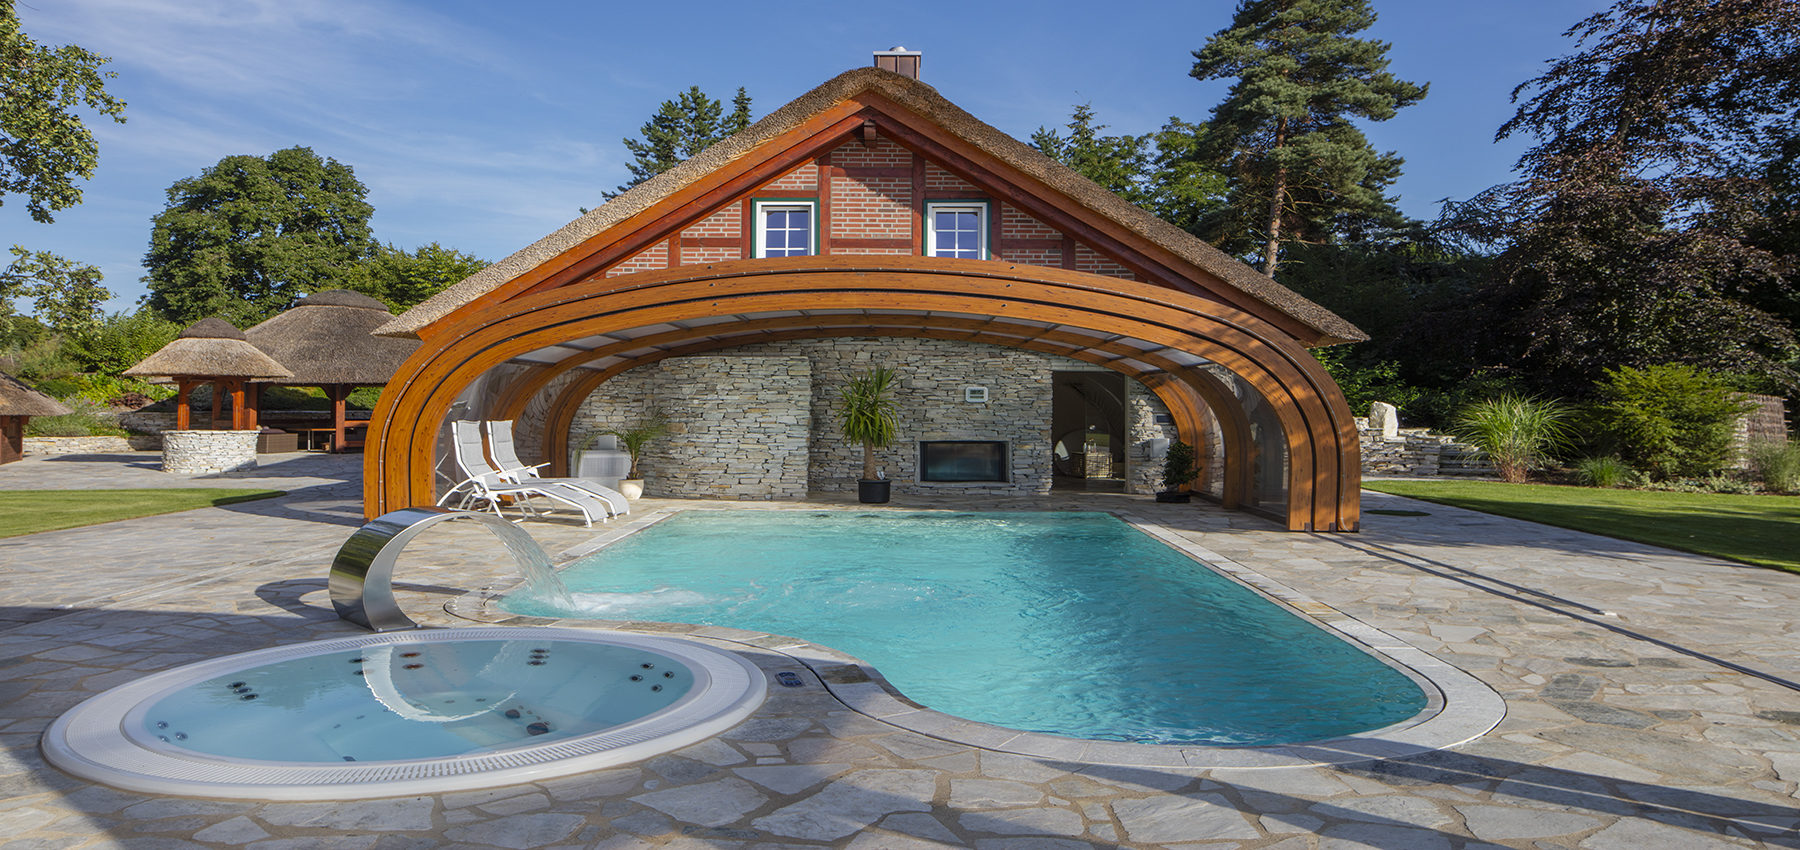 sun abris la r f rence de l 39 abri piscine bois. Black Bedroom Furniture Sets. Home Design Ideas